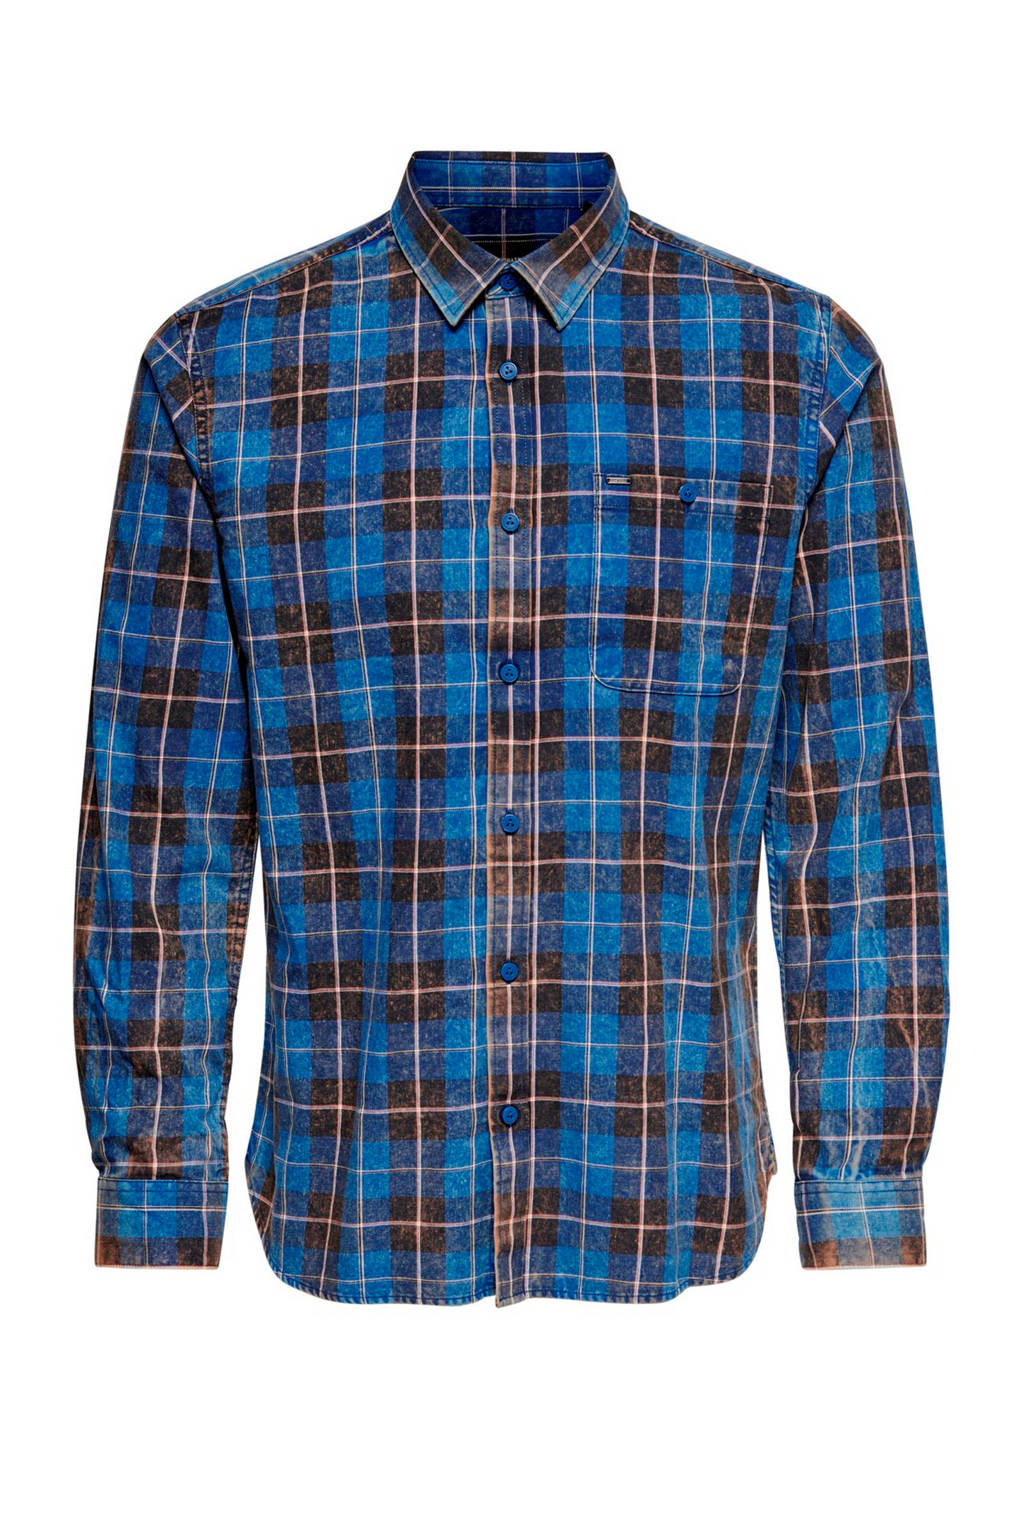 ONLY & SONS geruit regular fit overhemd donkerblauw, Donkerblauw